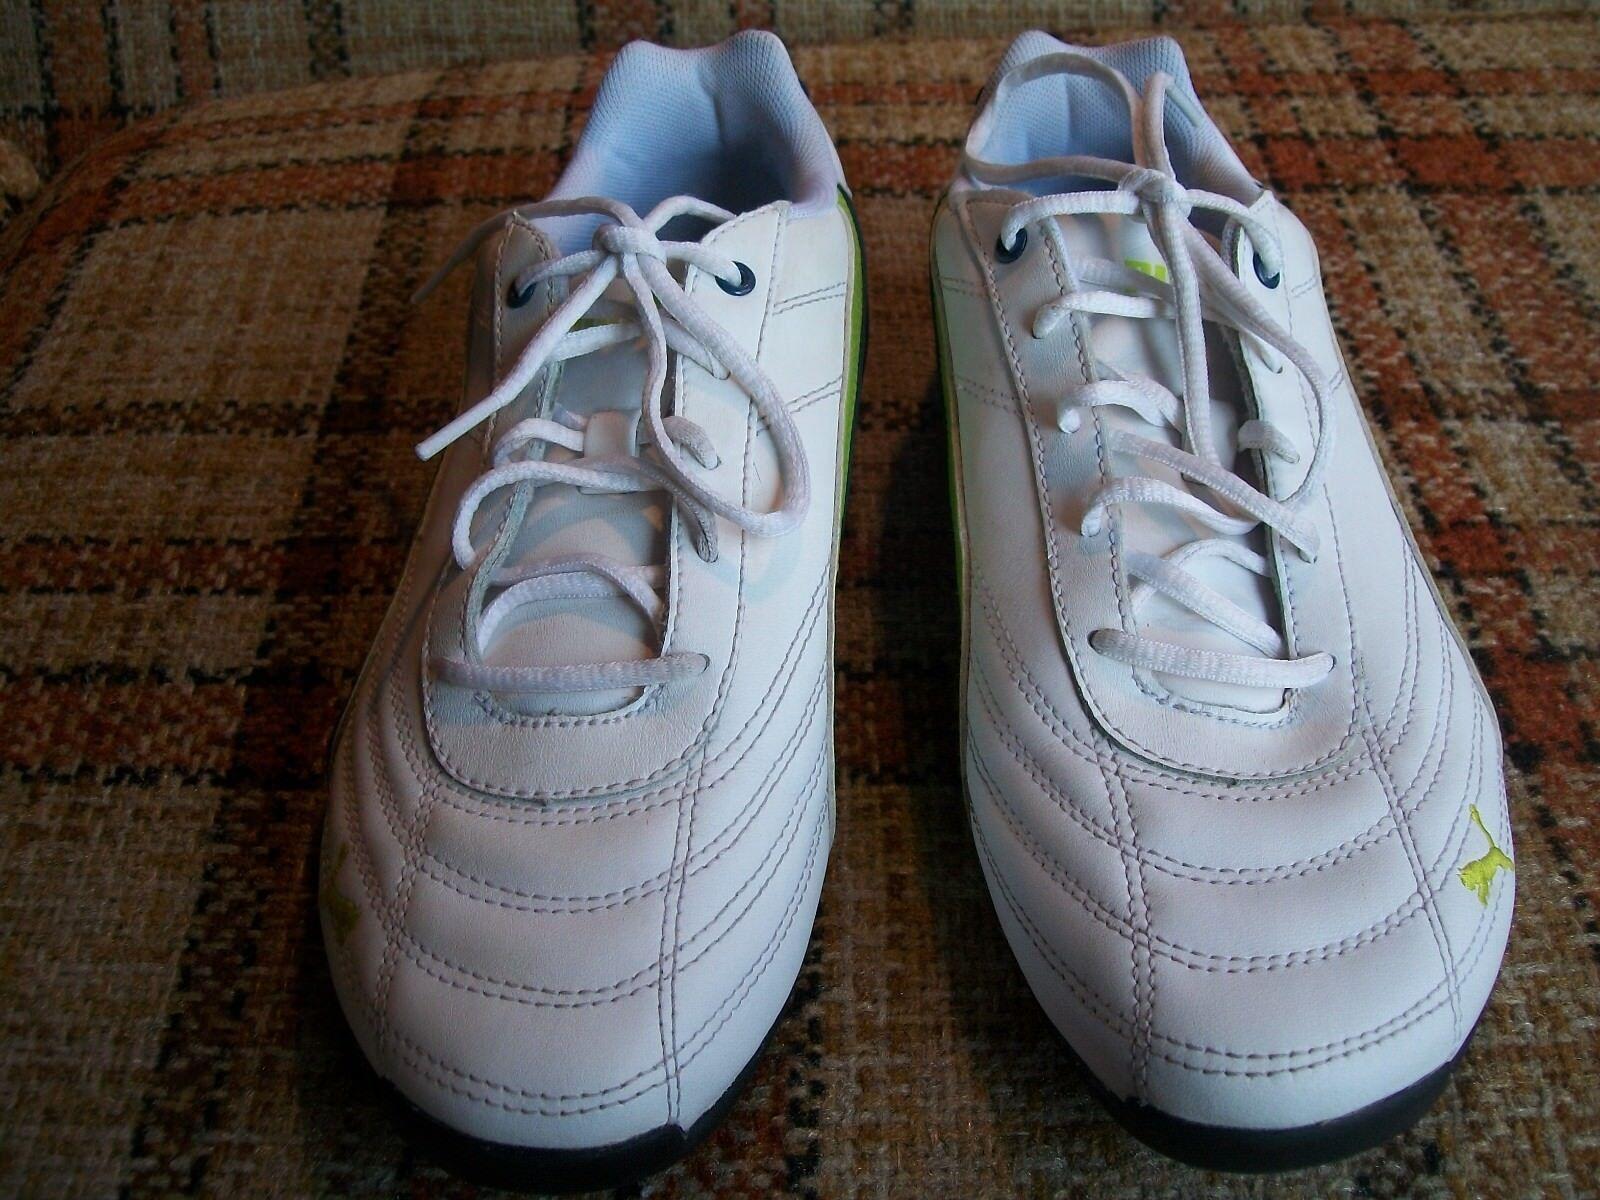 puma   taille 6,5 ()    blanc  vert les chaussures d'athlétisme 302824 40 4fb011